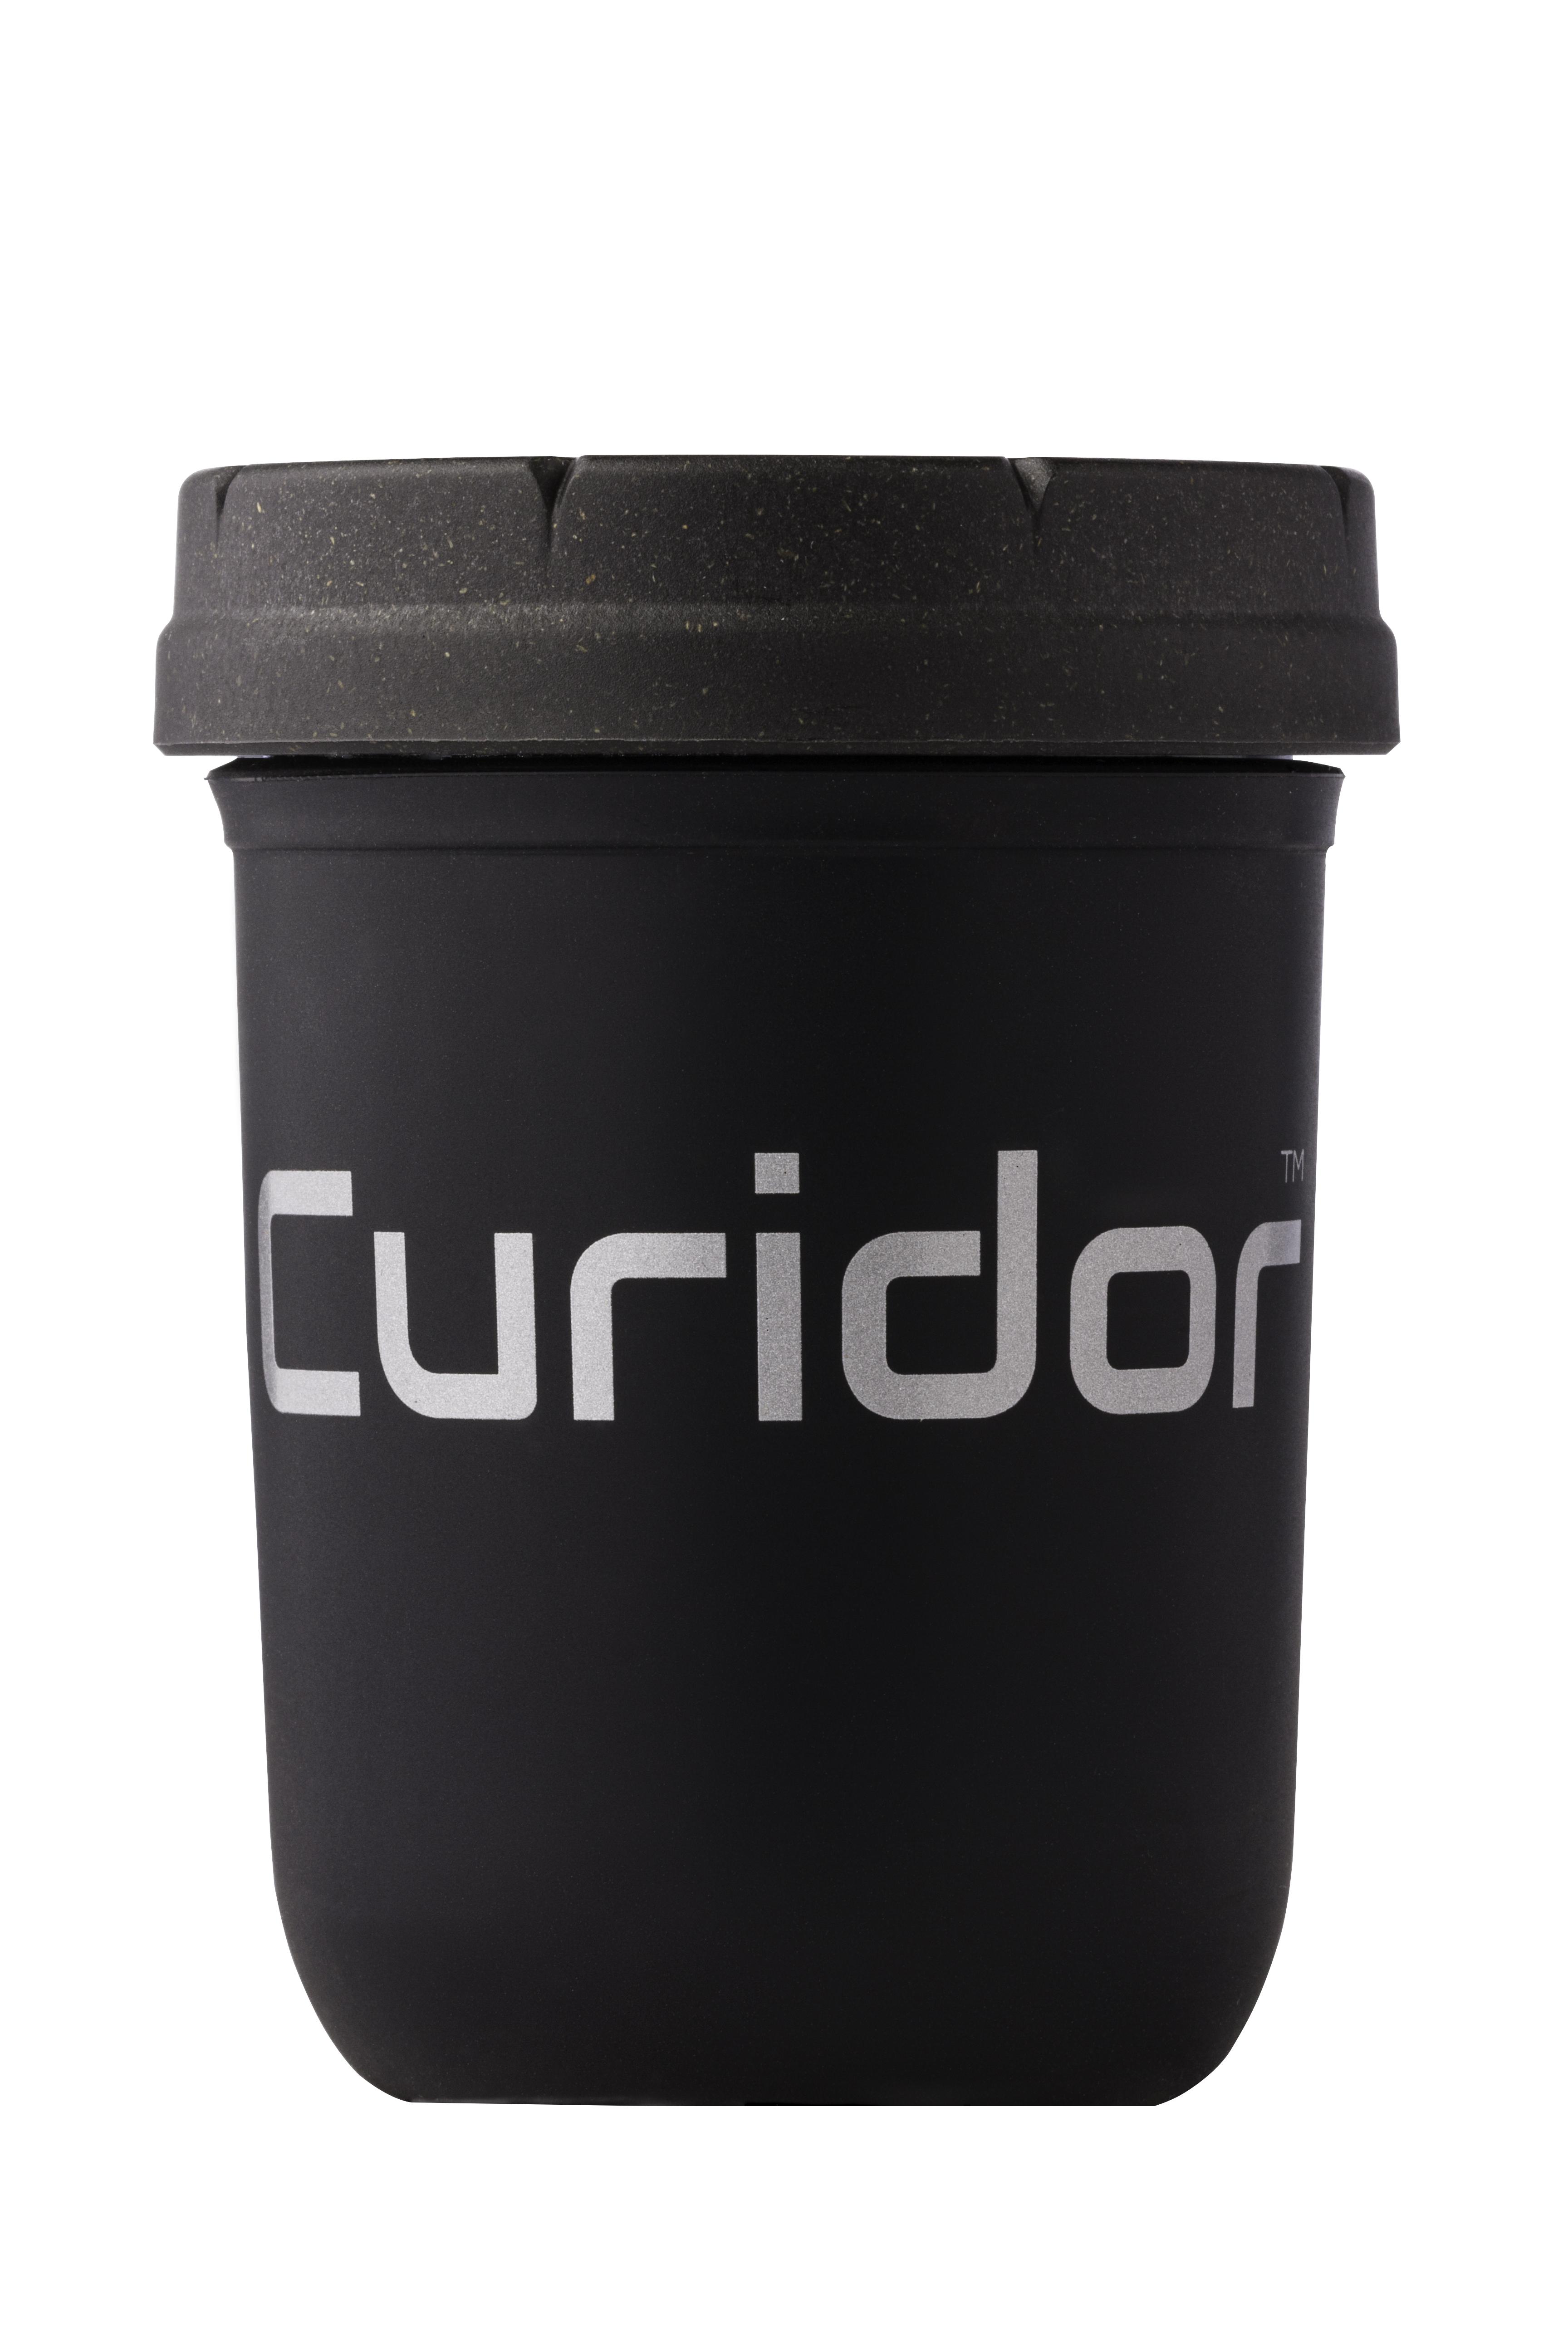 Curidor™